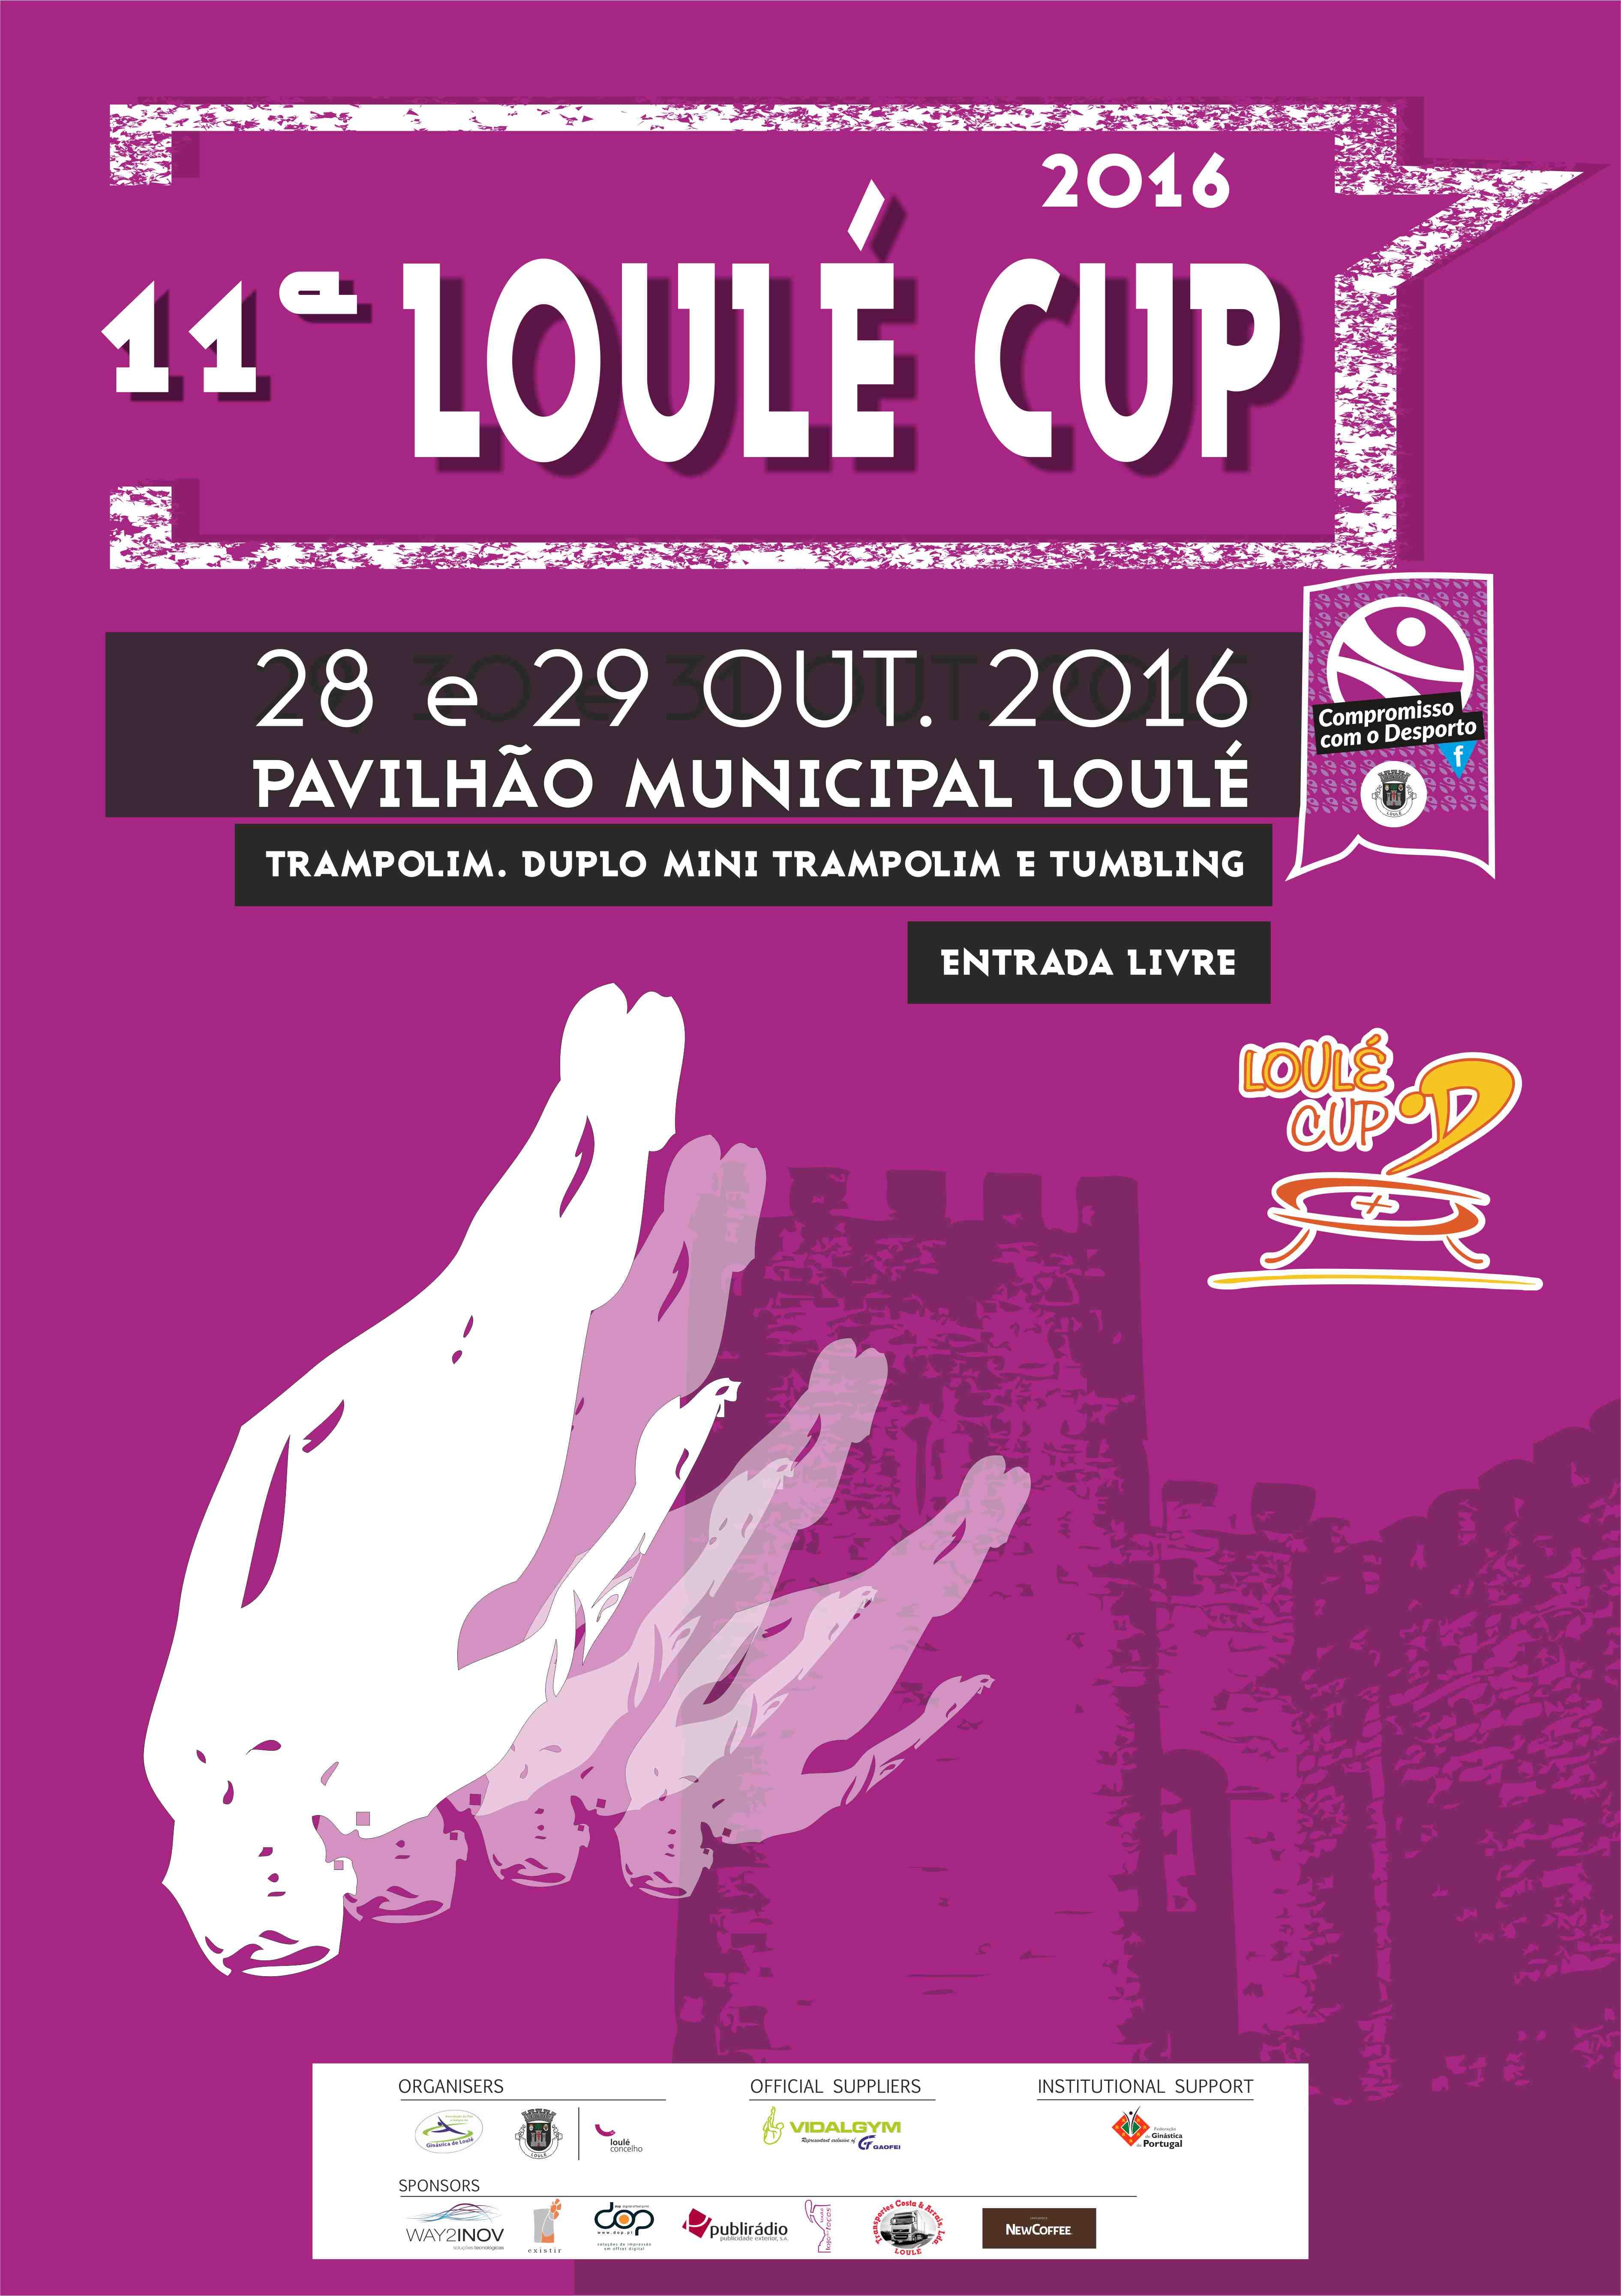 Loulé Cup